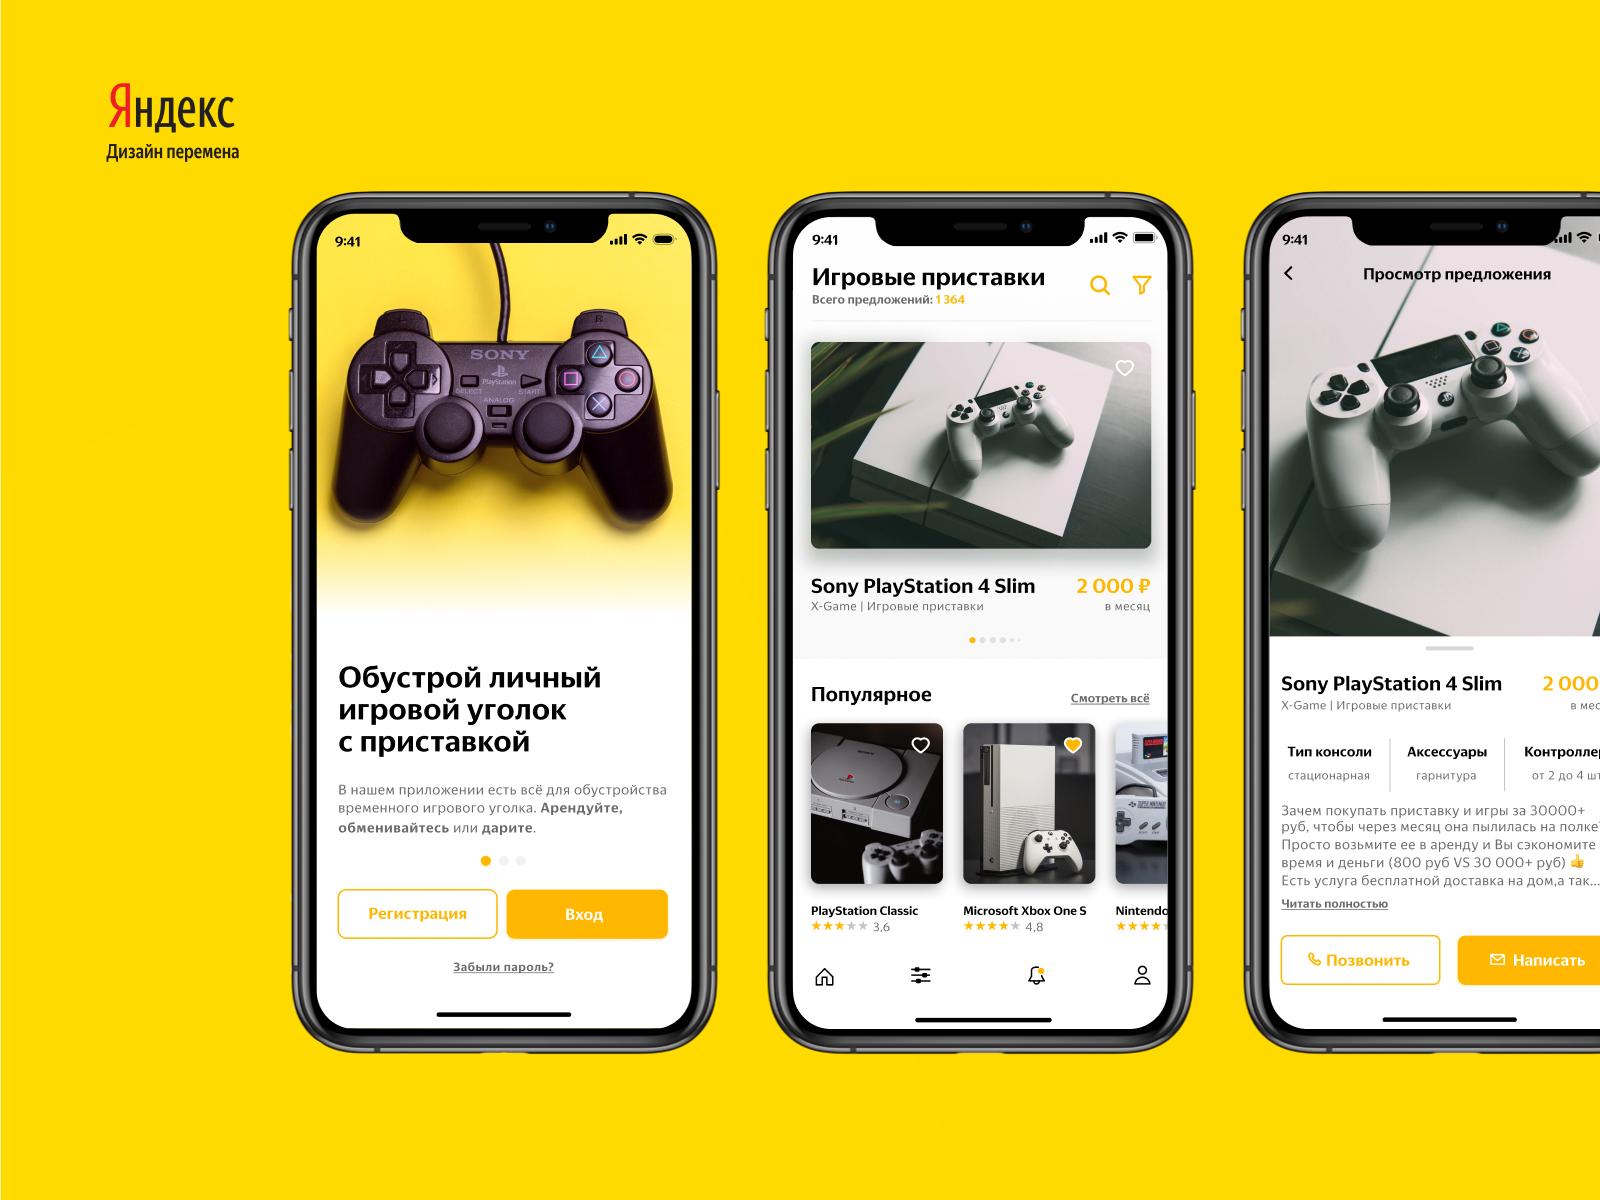 Yandex Rent Game Console App by Alina Zaripova on Dribbble